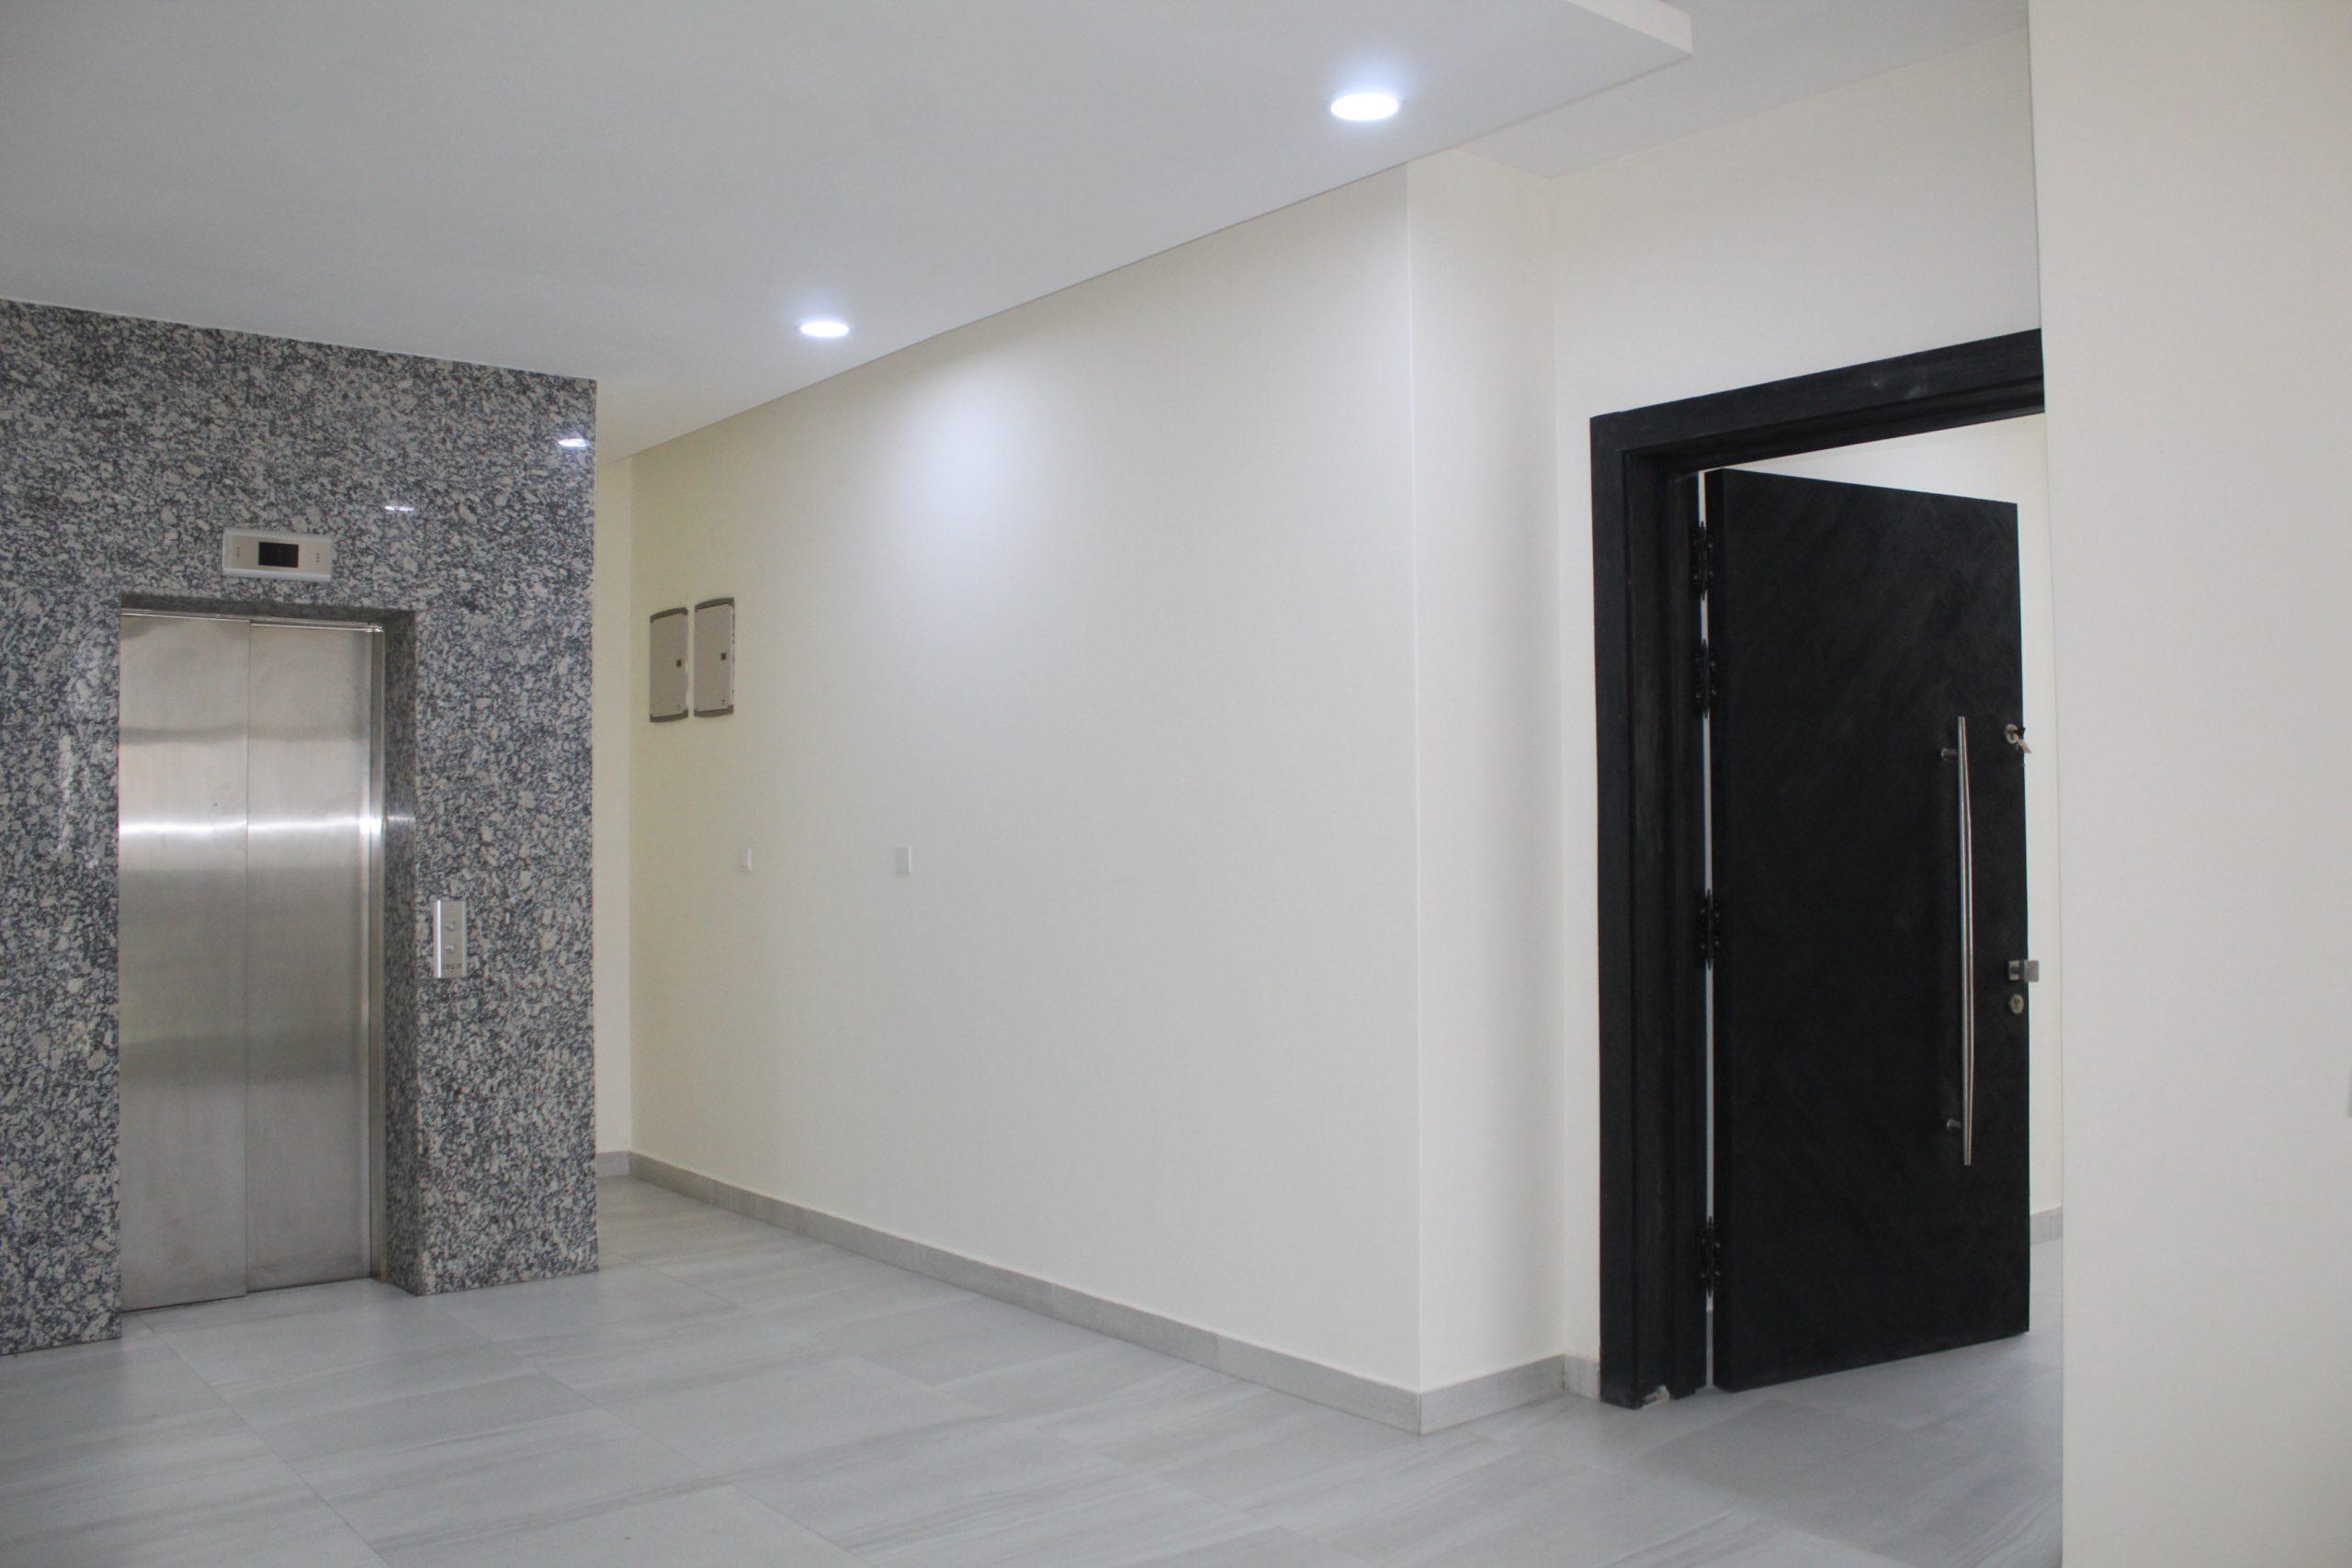 Luxury 3 bedroom flat for sale